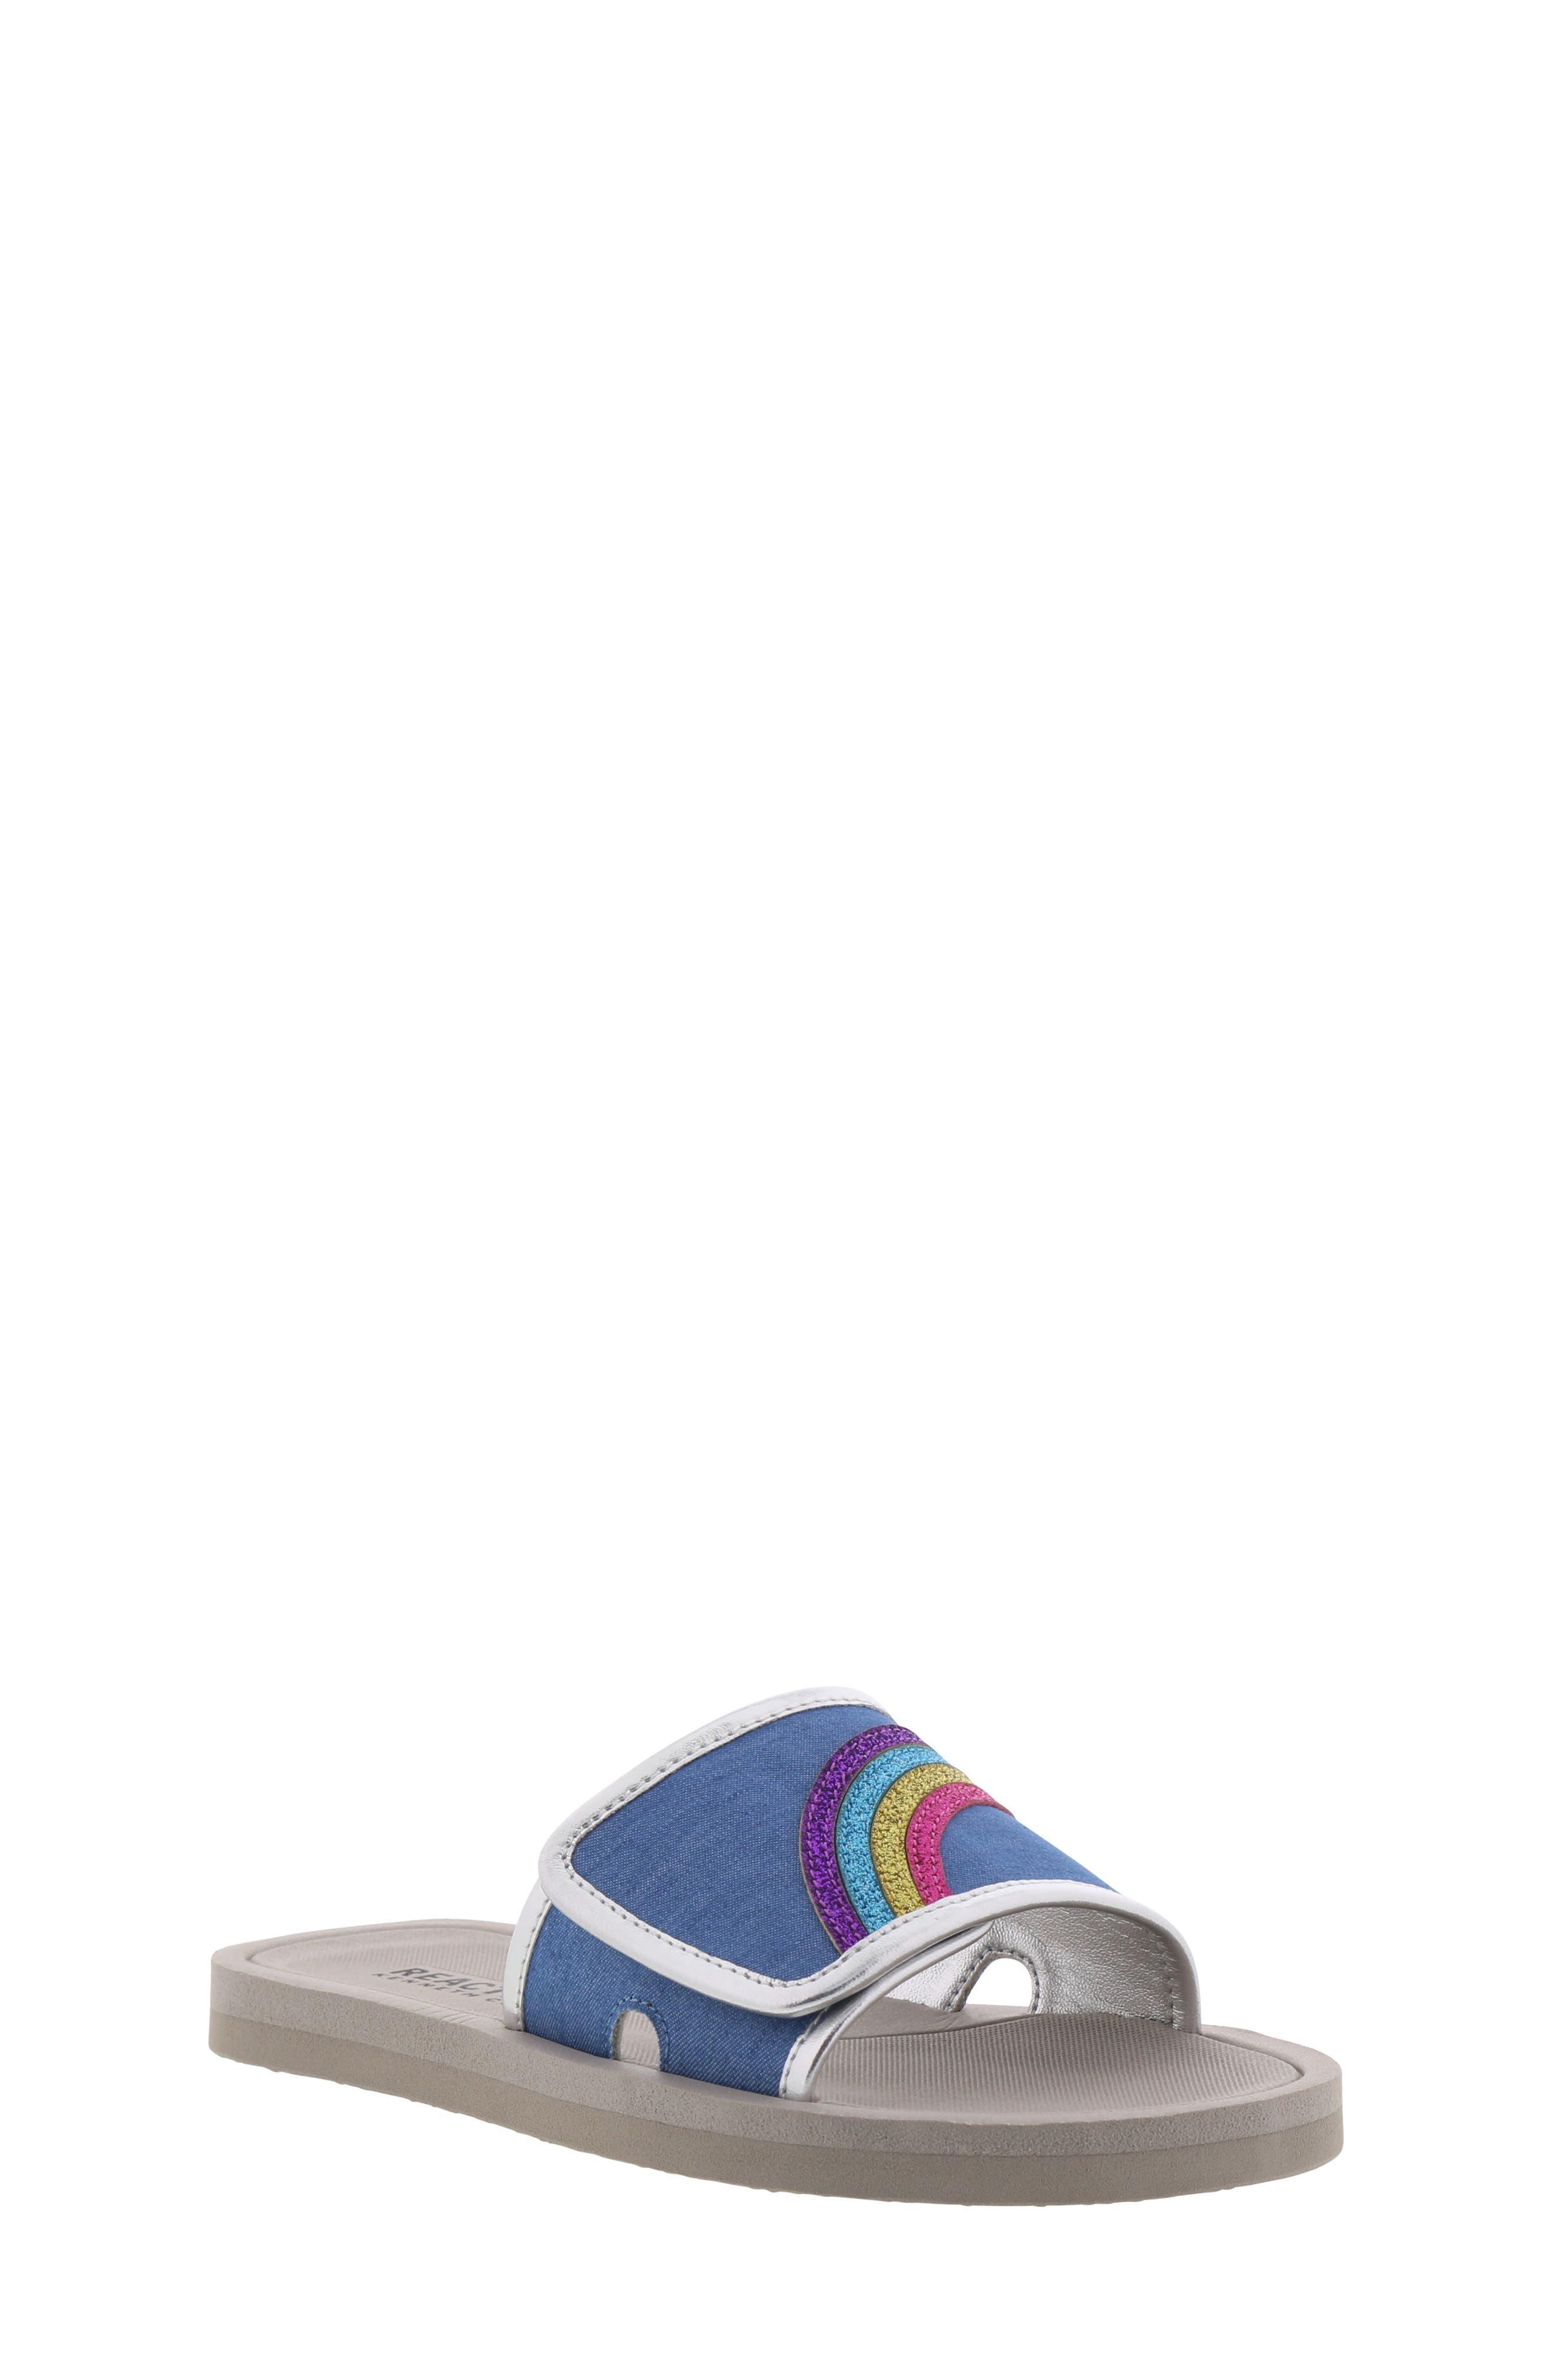 REACTION KENNETH COLE, Elise Karla Rainbow Slide Sandal, Main thumbnail 1, color, DENIM